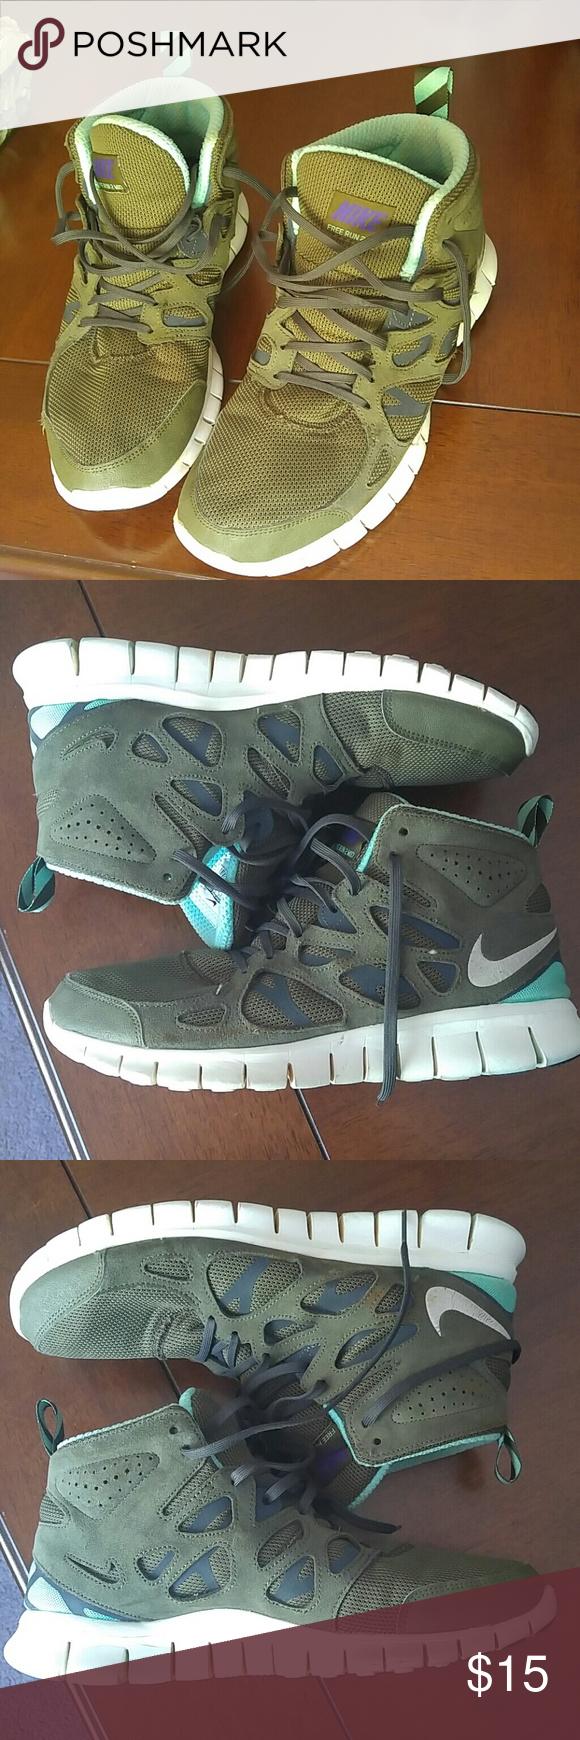 Nike Free Run 2 SneakerBoot,Nike Lunar LDV SneakerBoot,and